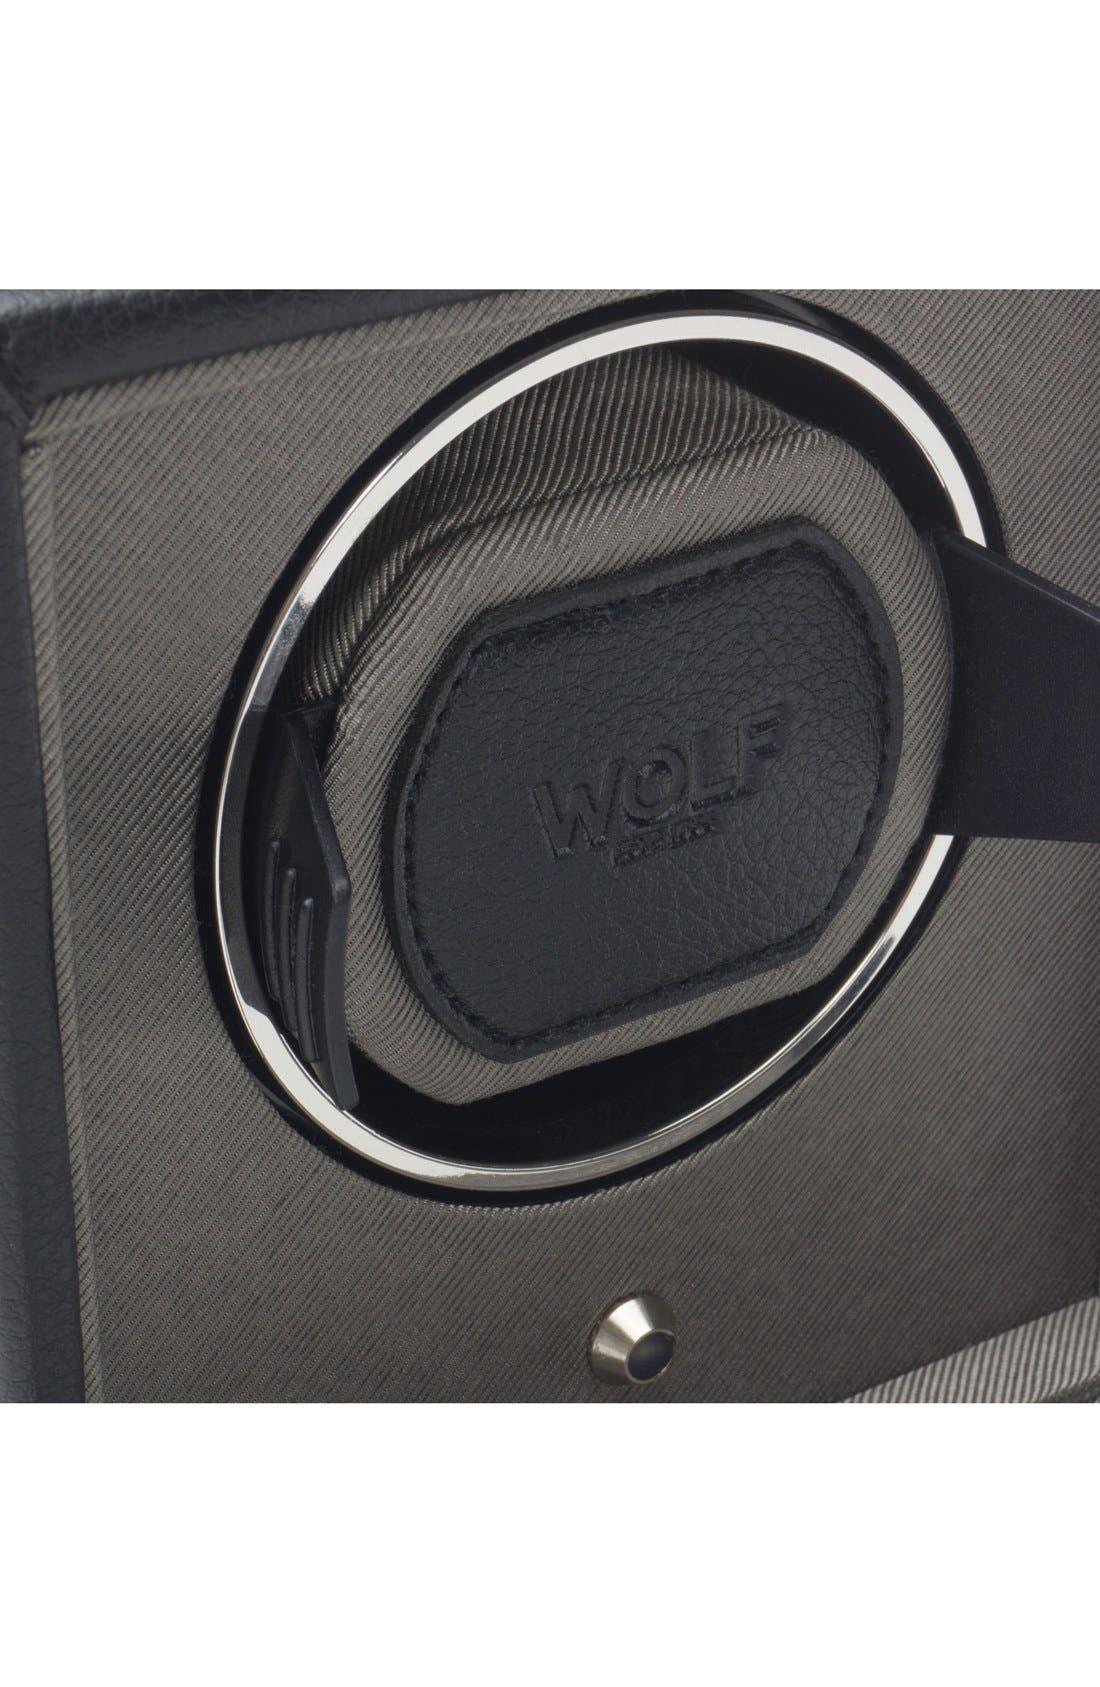 Alternate Image 3  - Wolf Cub Watch Winder